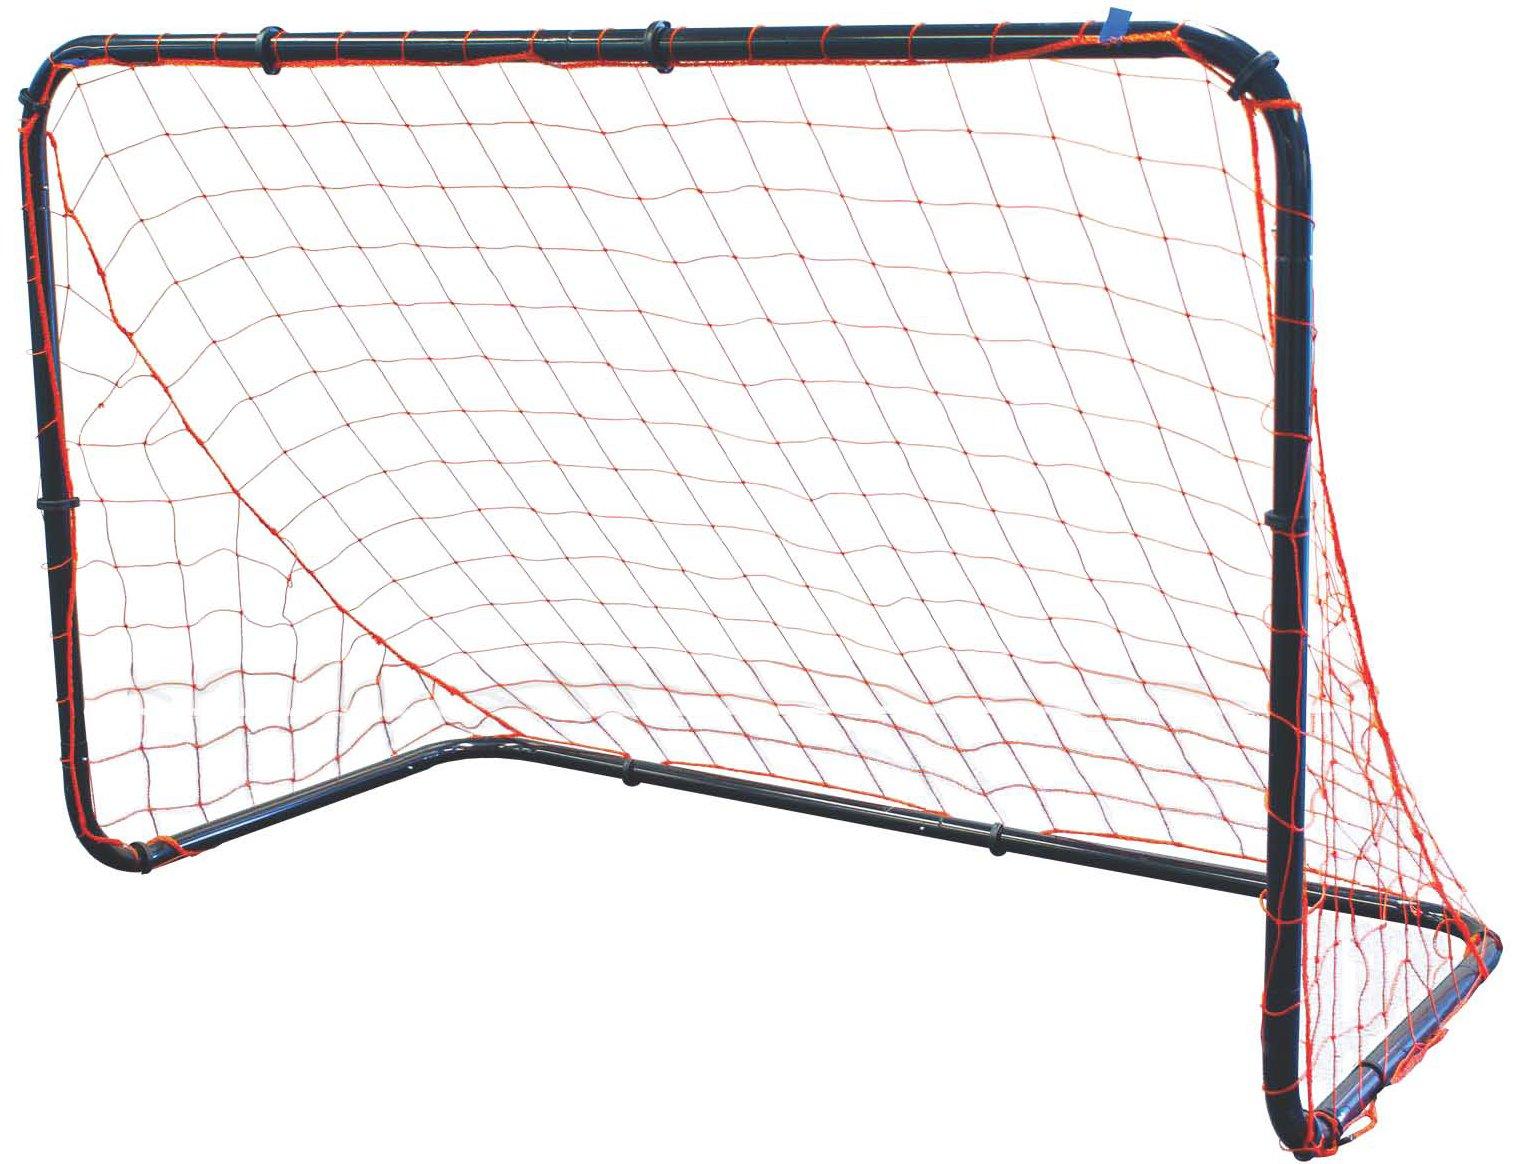 Park & Sun Sports Steel Frame Multi-Sport Goal with Nylon Bungee Slip Net, 6' W x 4' H x 3' D